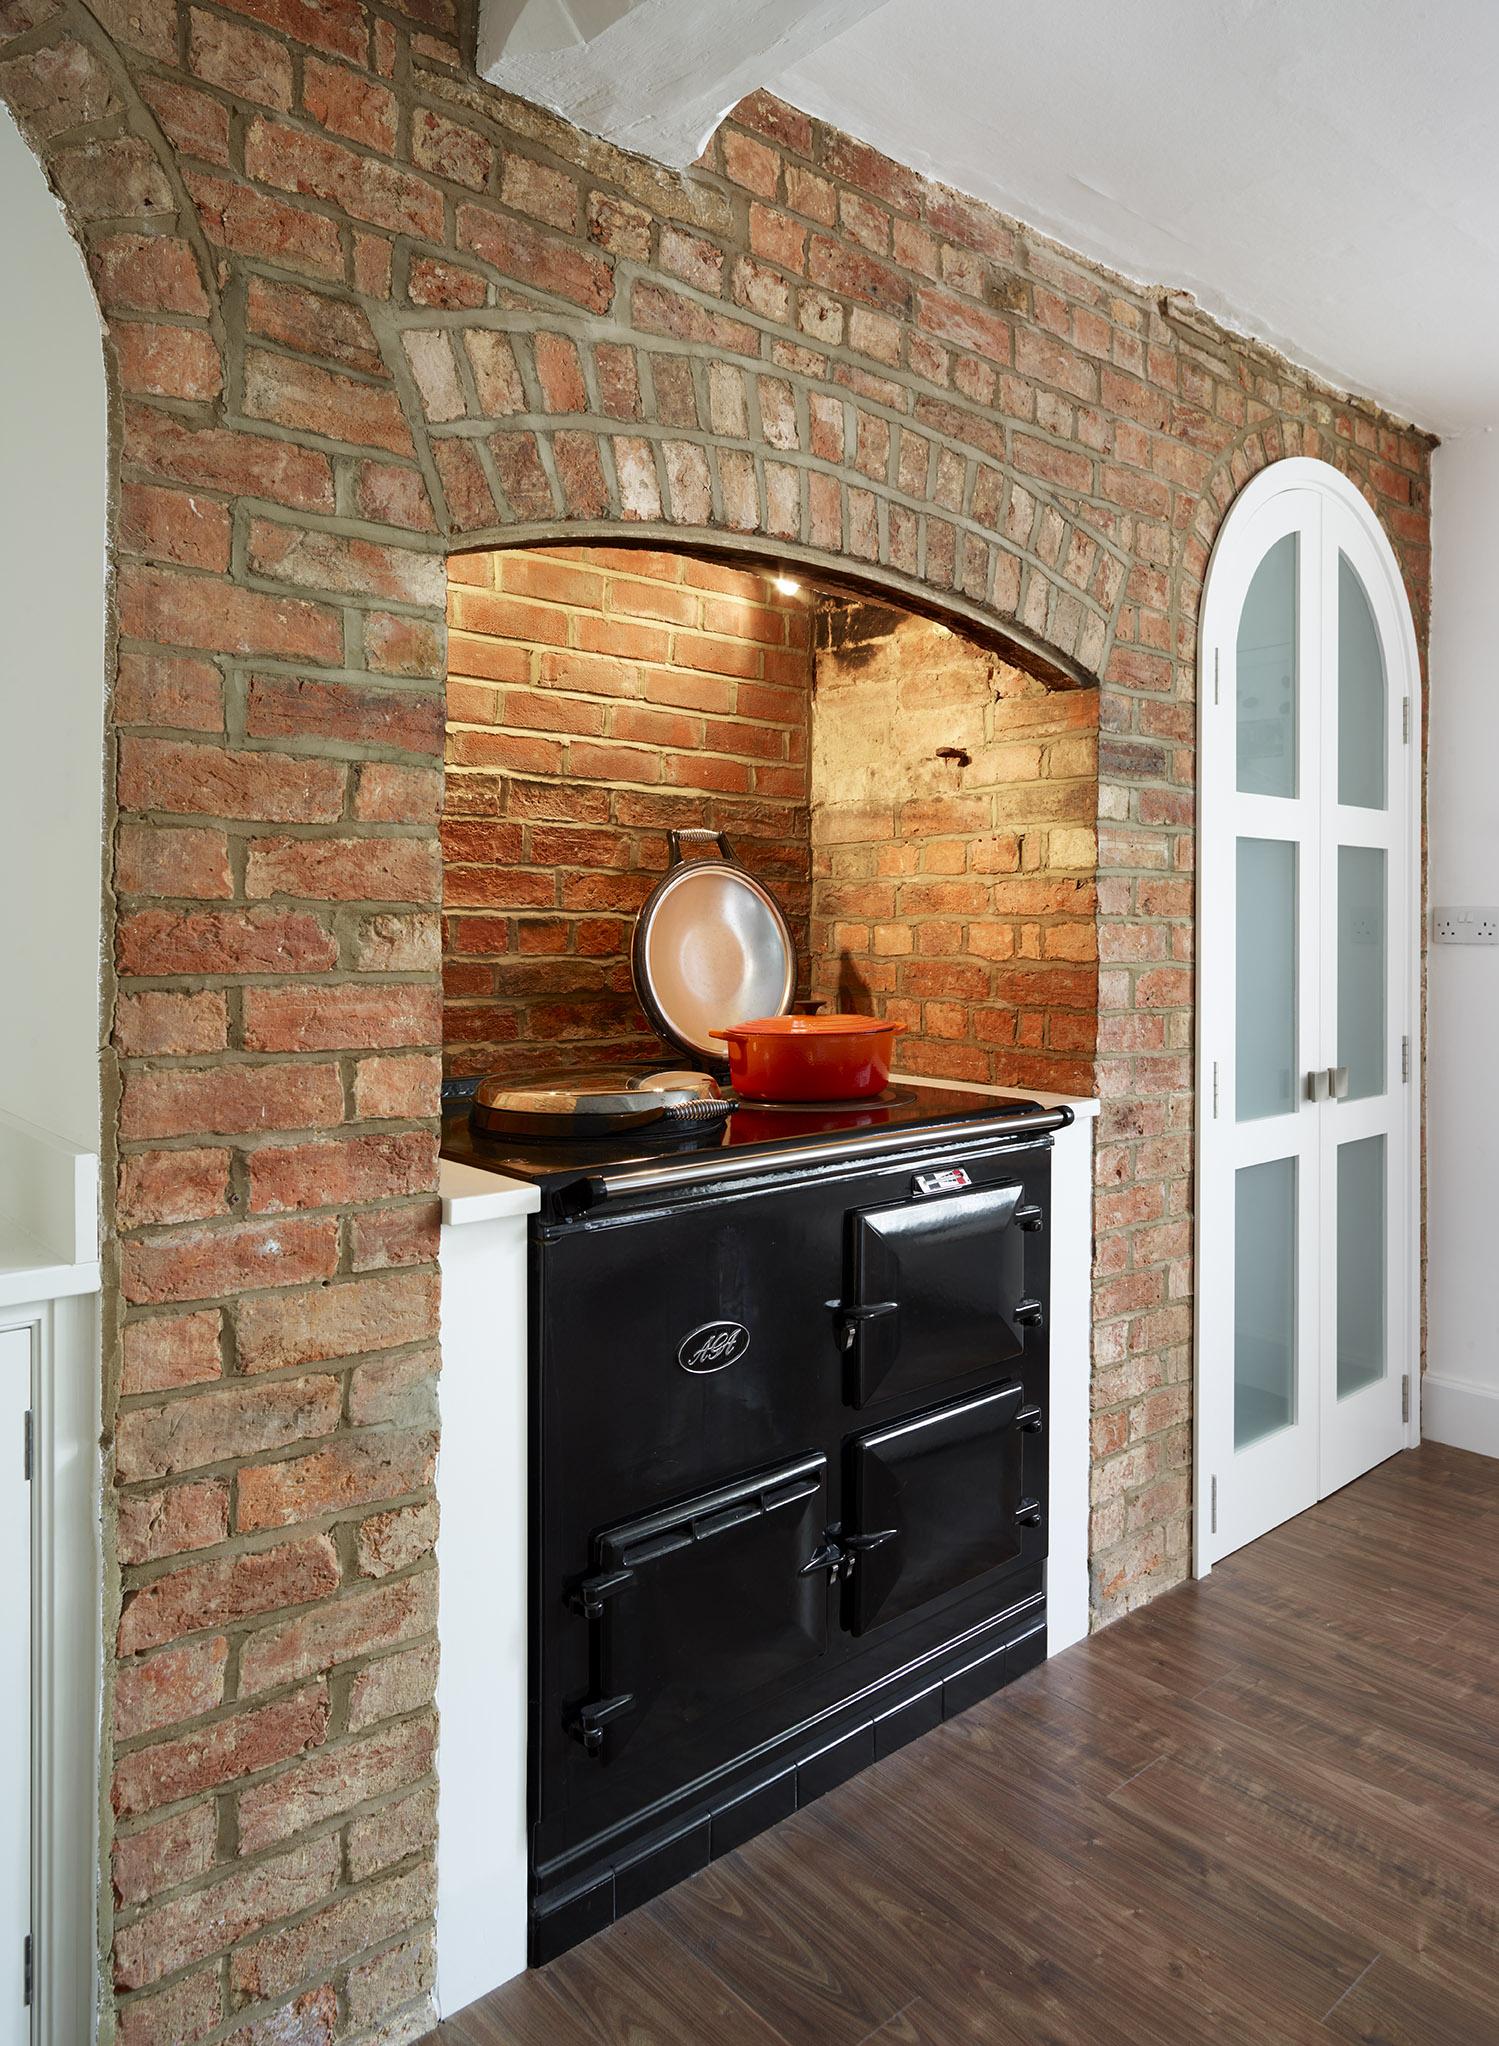 Stoke Goldington - Aga set into existing fireplace within shaker style kitchen